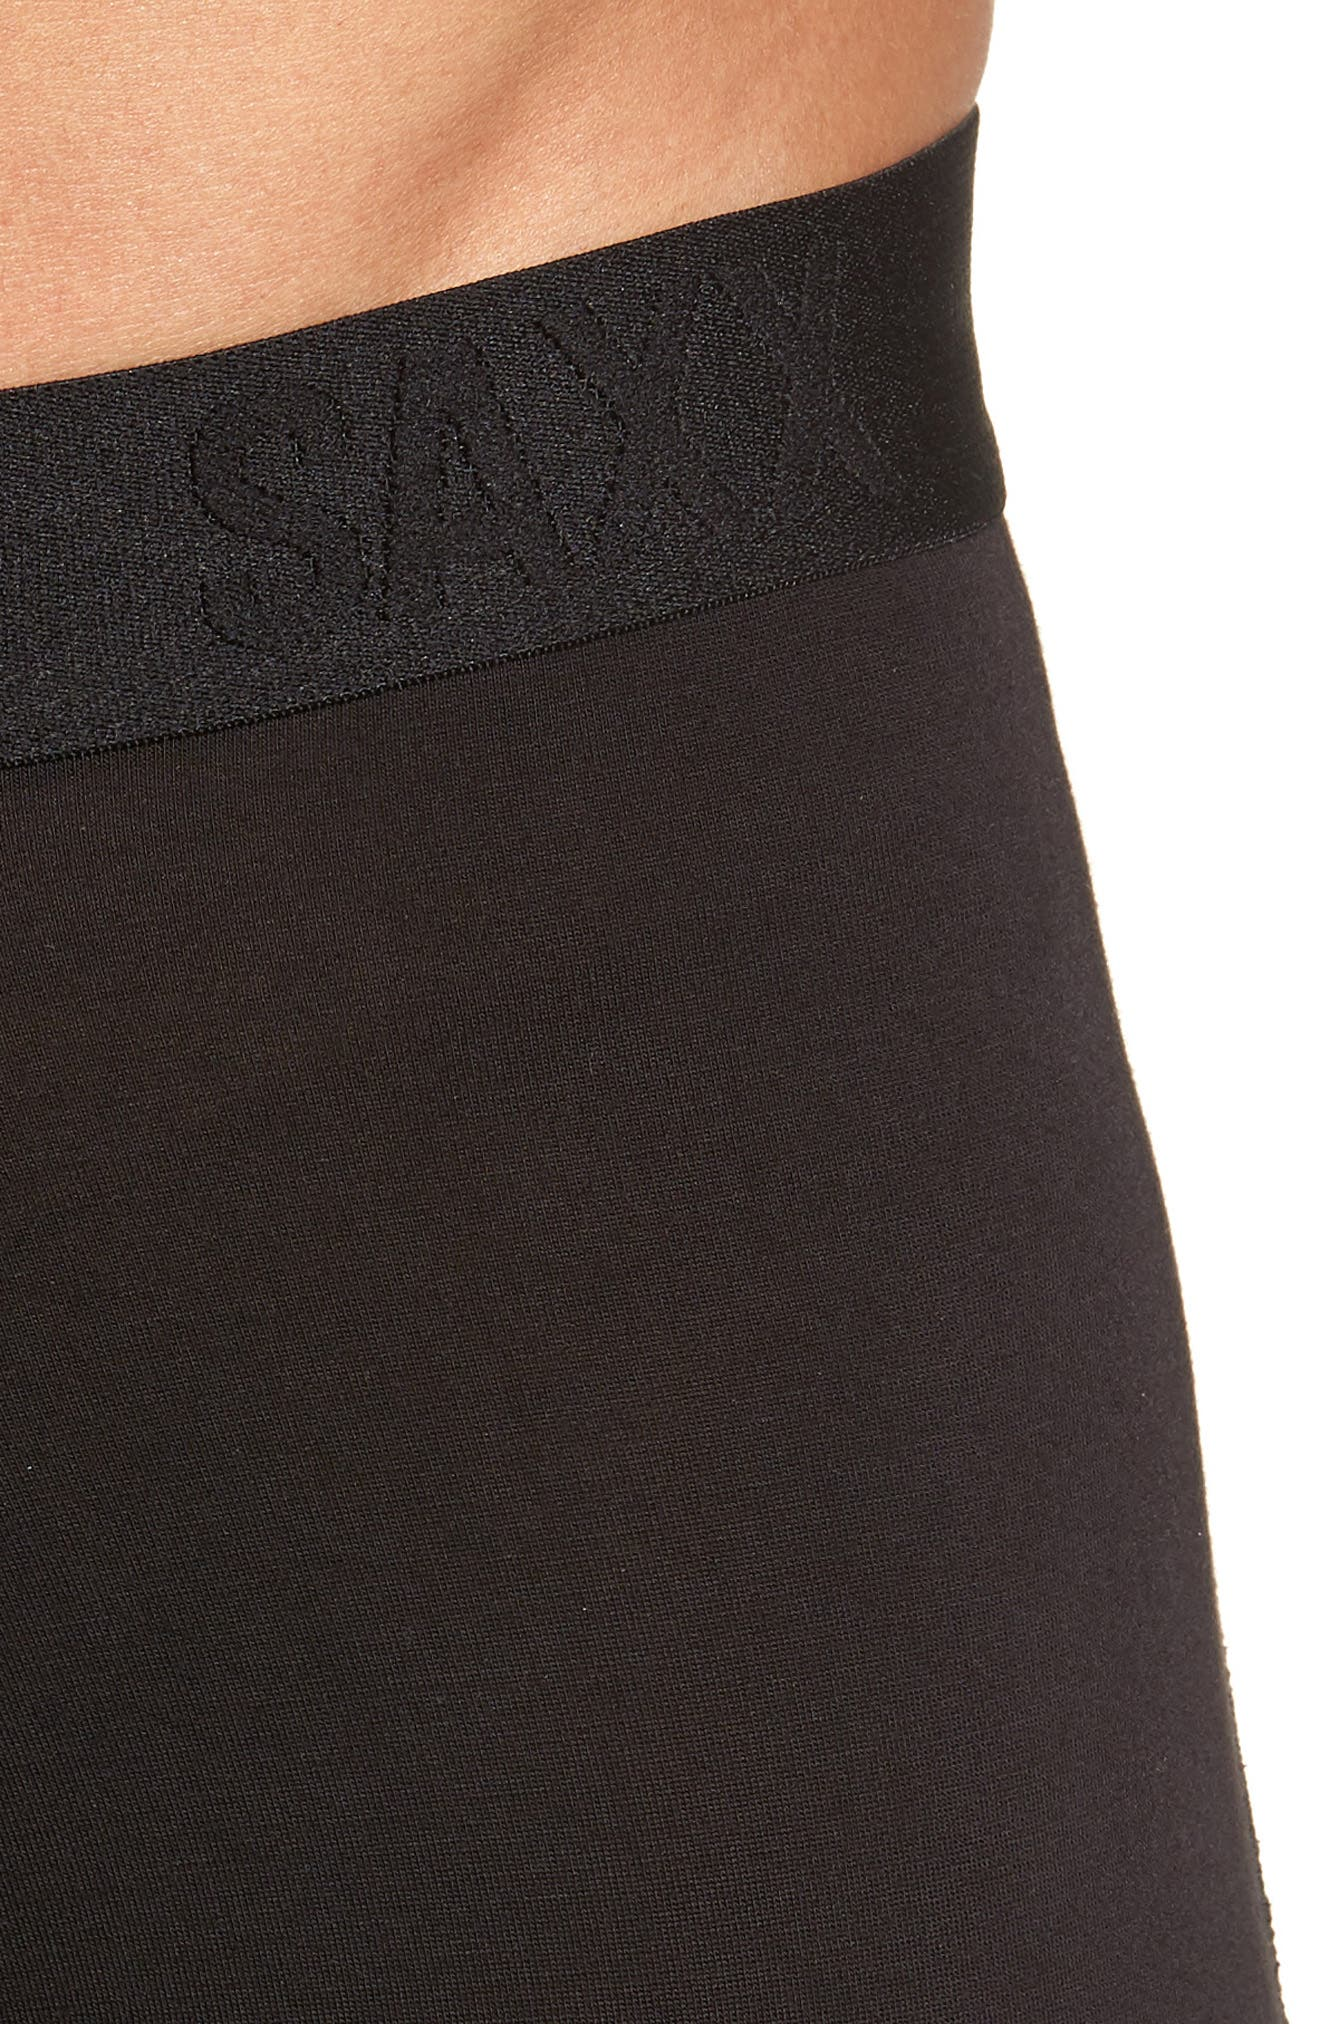 SAXX, 'Vibe' Stretch Boxer Briefs, Alternate thumbnail 4, color, BLACK/ BLACK